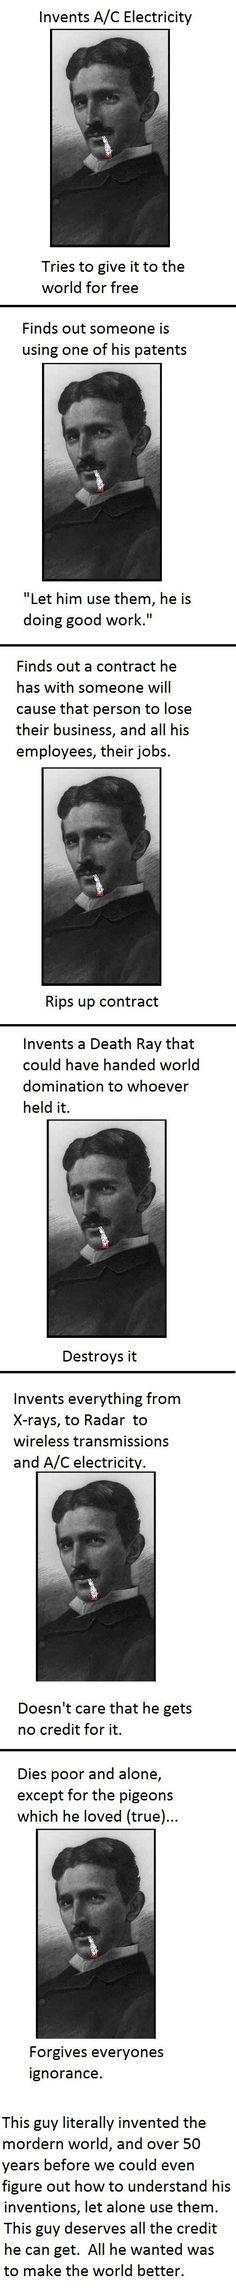 Nicola Tesla. Pure genius.